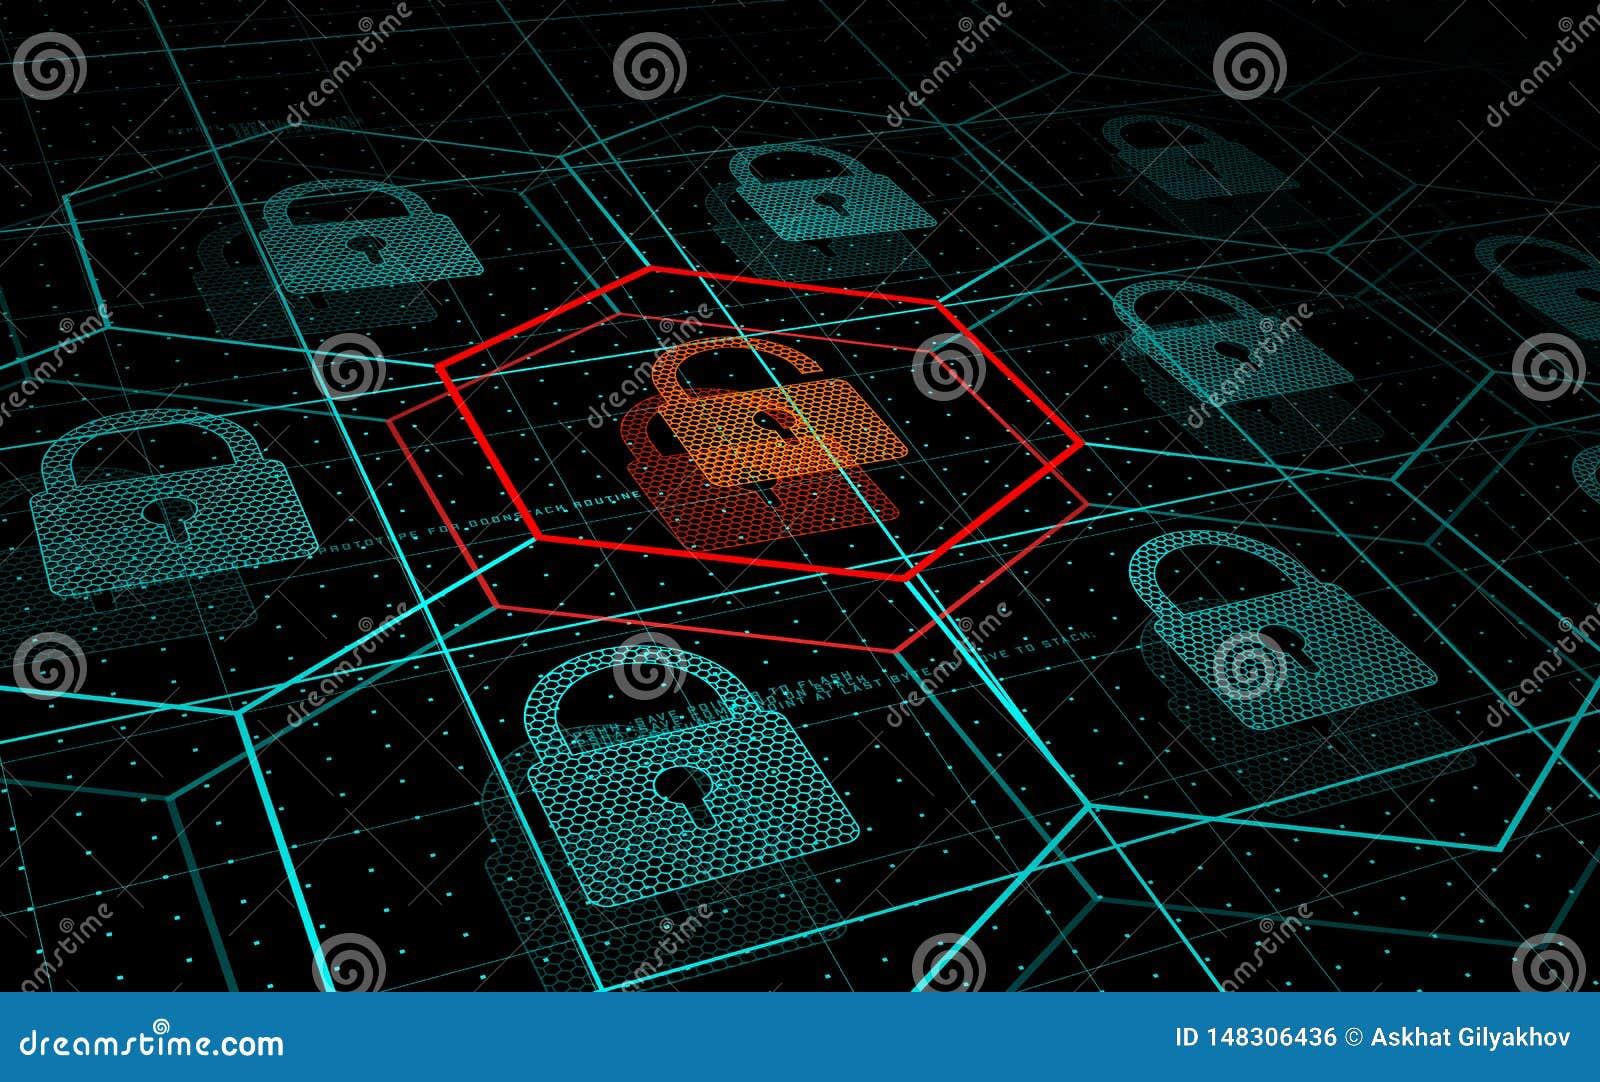 Attaque de Cyber, système sous la menace, attaque de DDoS